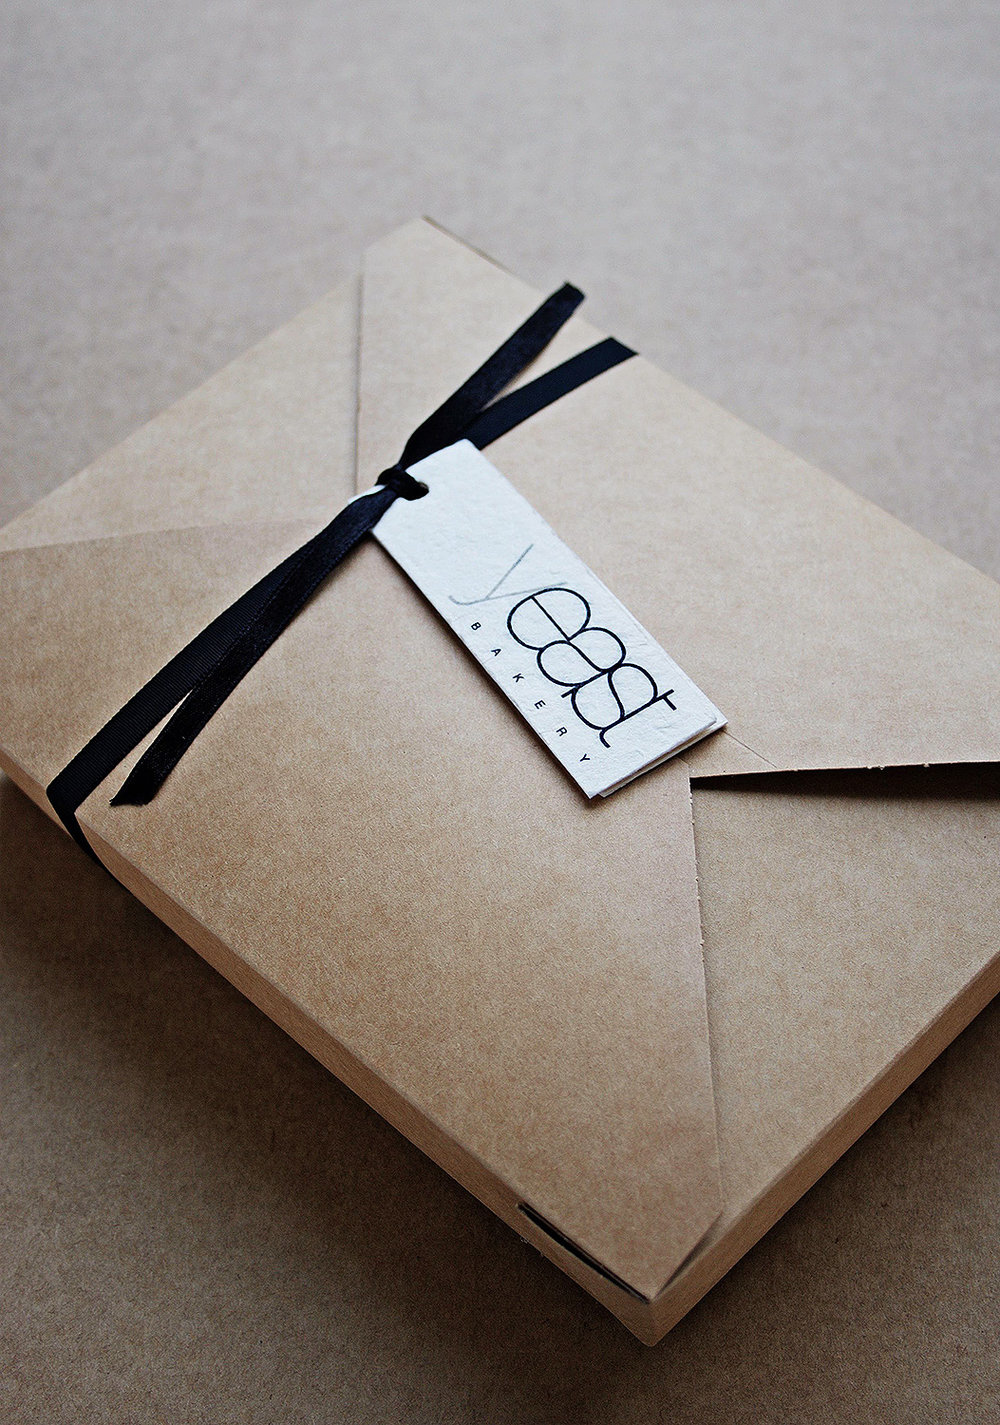 yeast-bakery-festive-box-of-treats.jpg